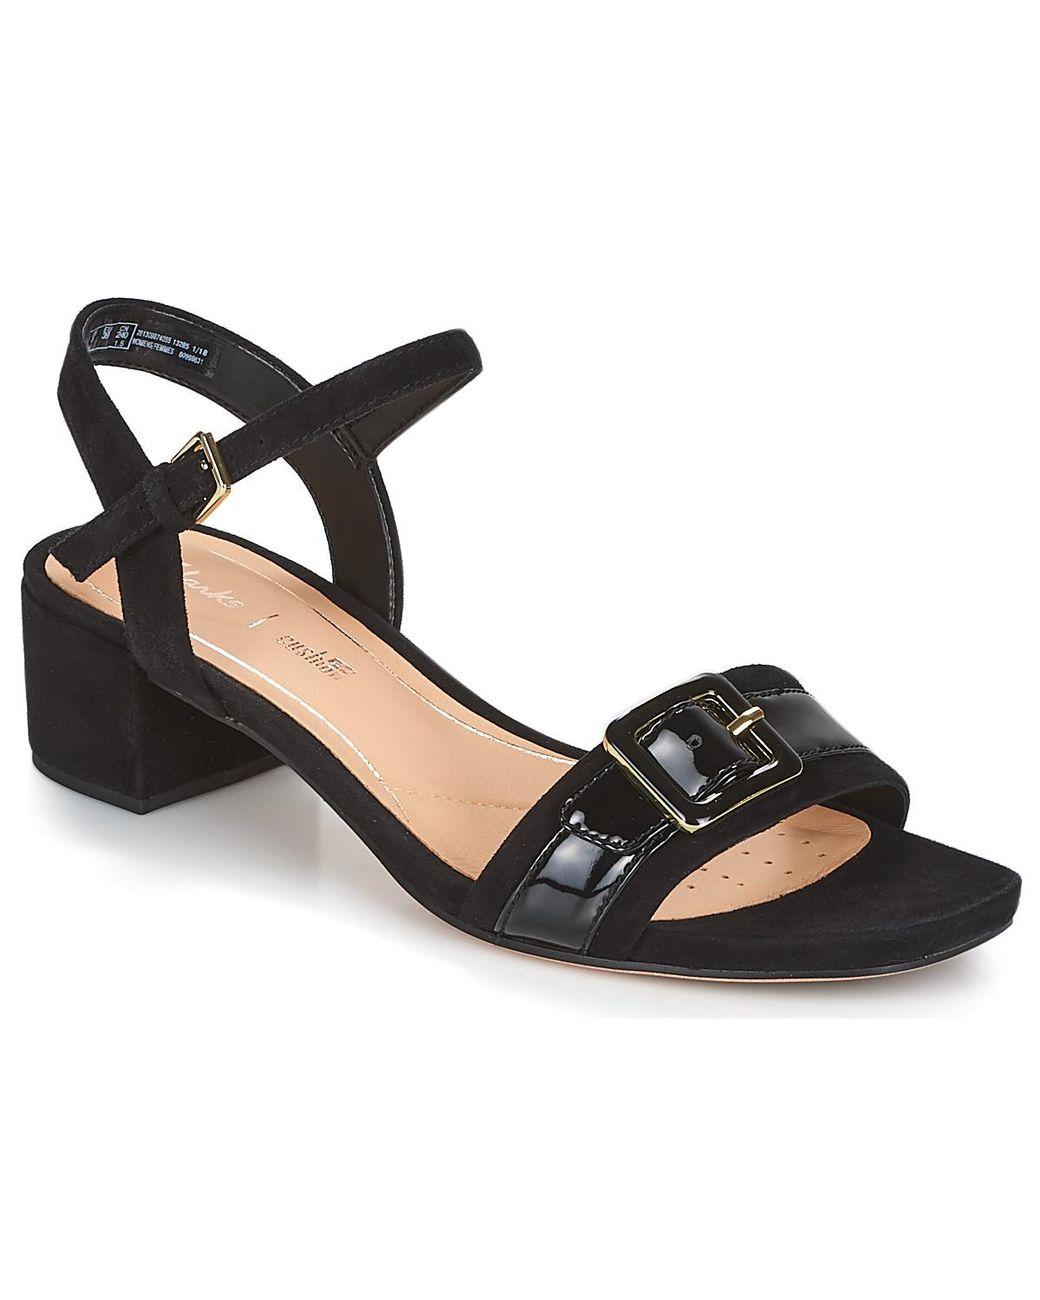 adfaca20e00 Clarks Orabella Shine Women s Sandals In Black in Black - Lyst